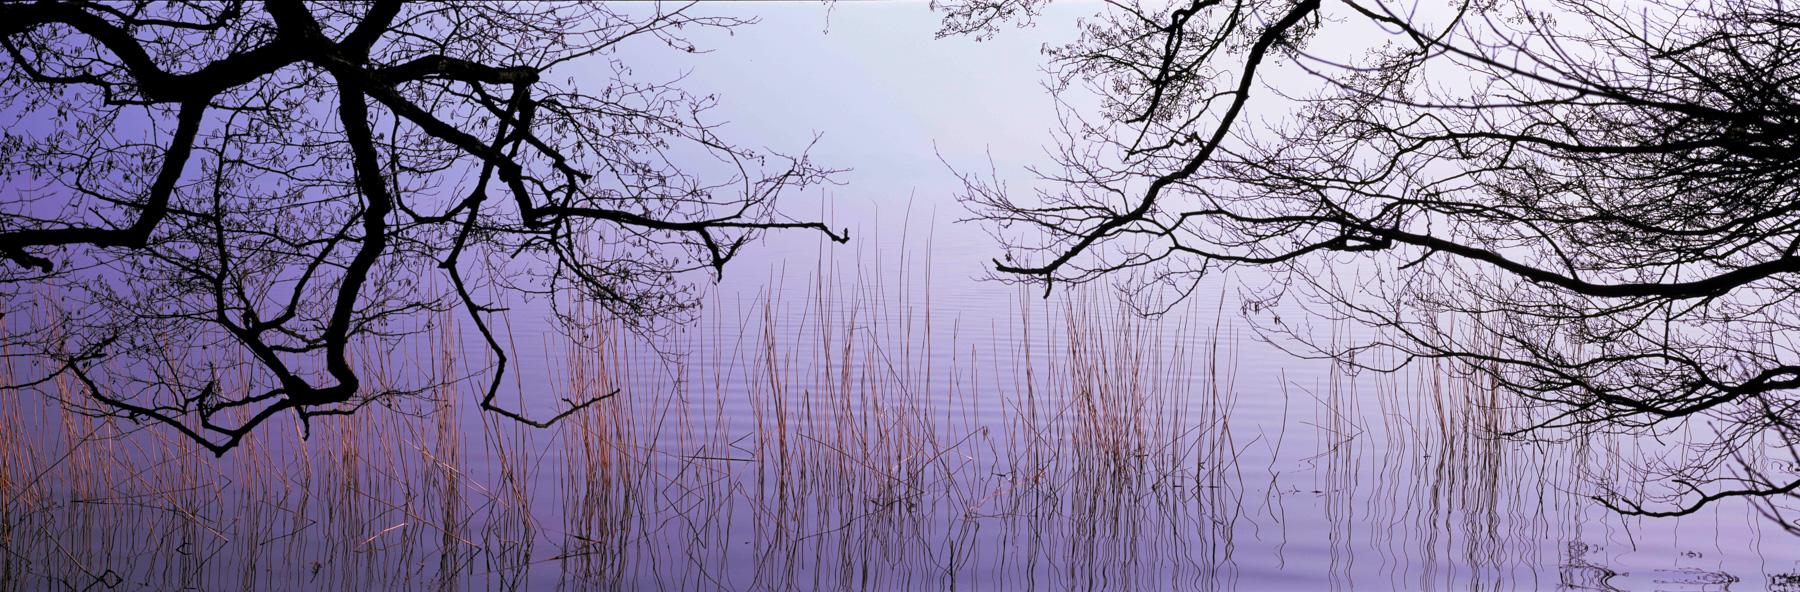 Spolsener-Moor-Sonnenaufgang-Febr-6